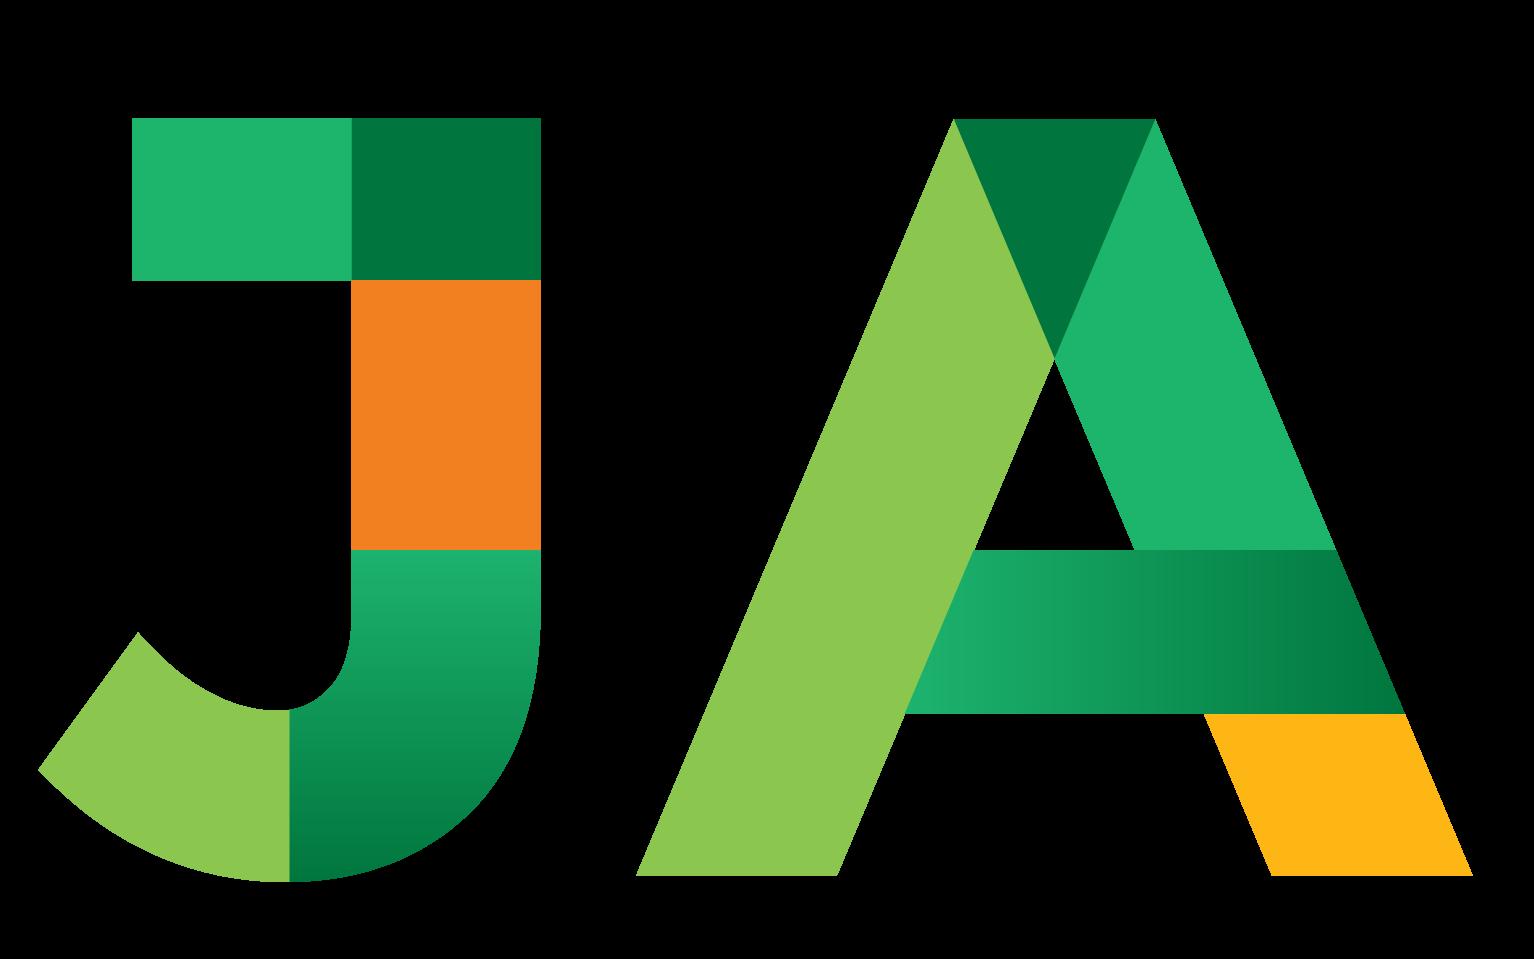 Logotipo JA